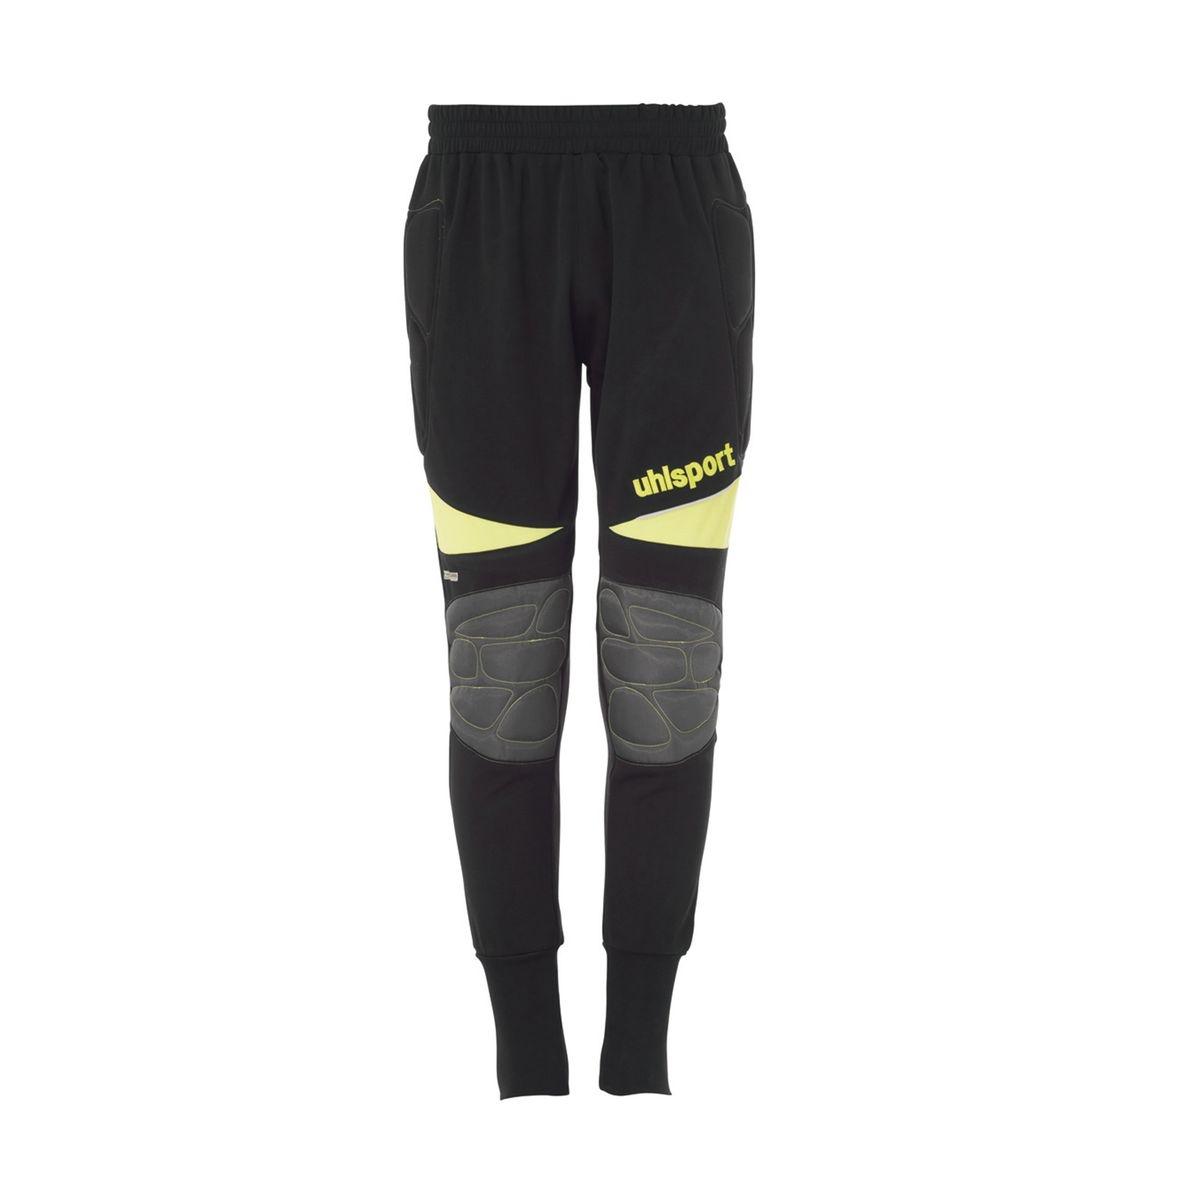 Pantalon Gardien Uhlsport Noir